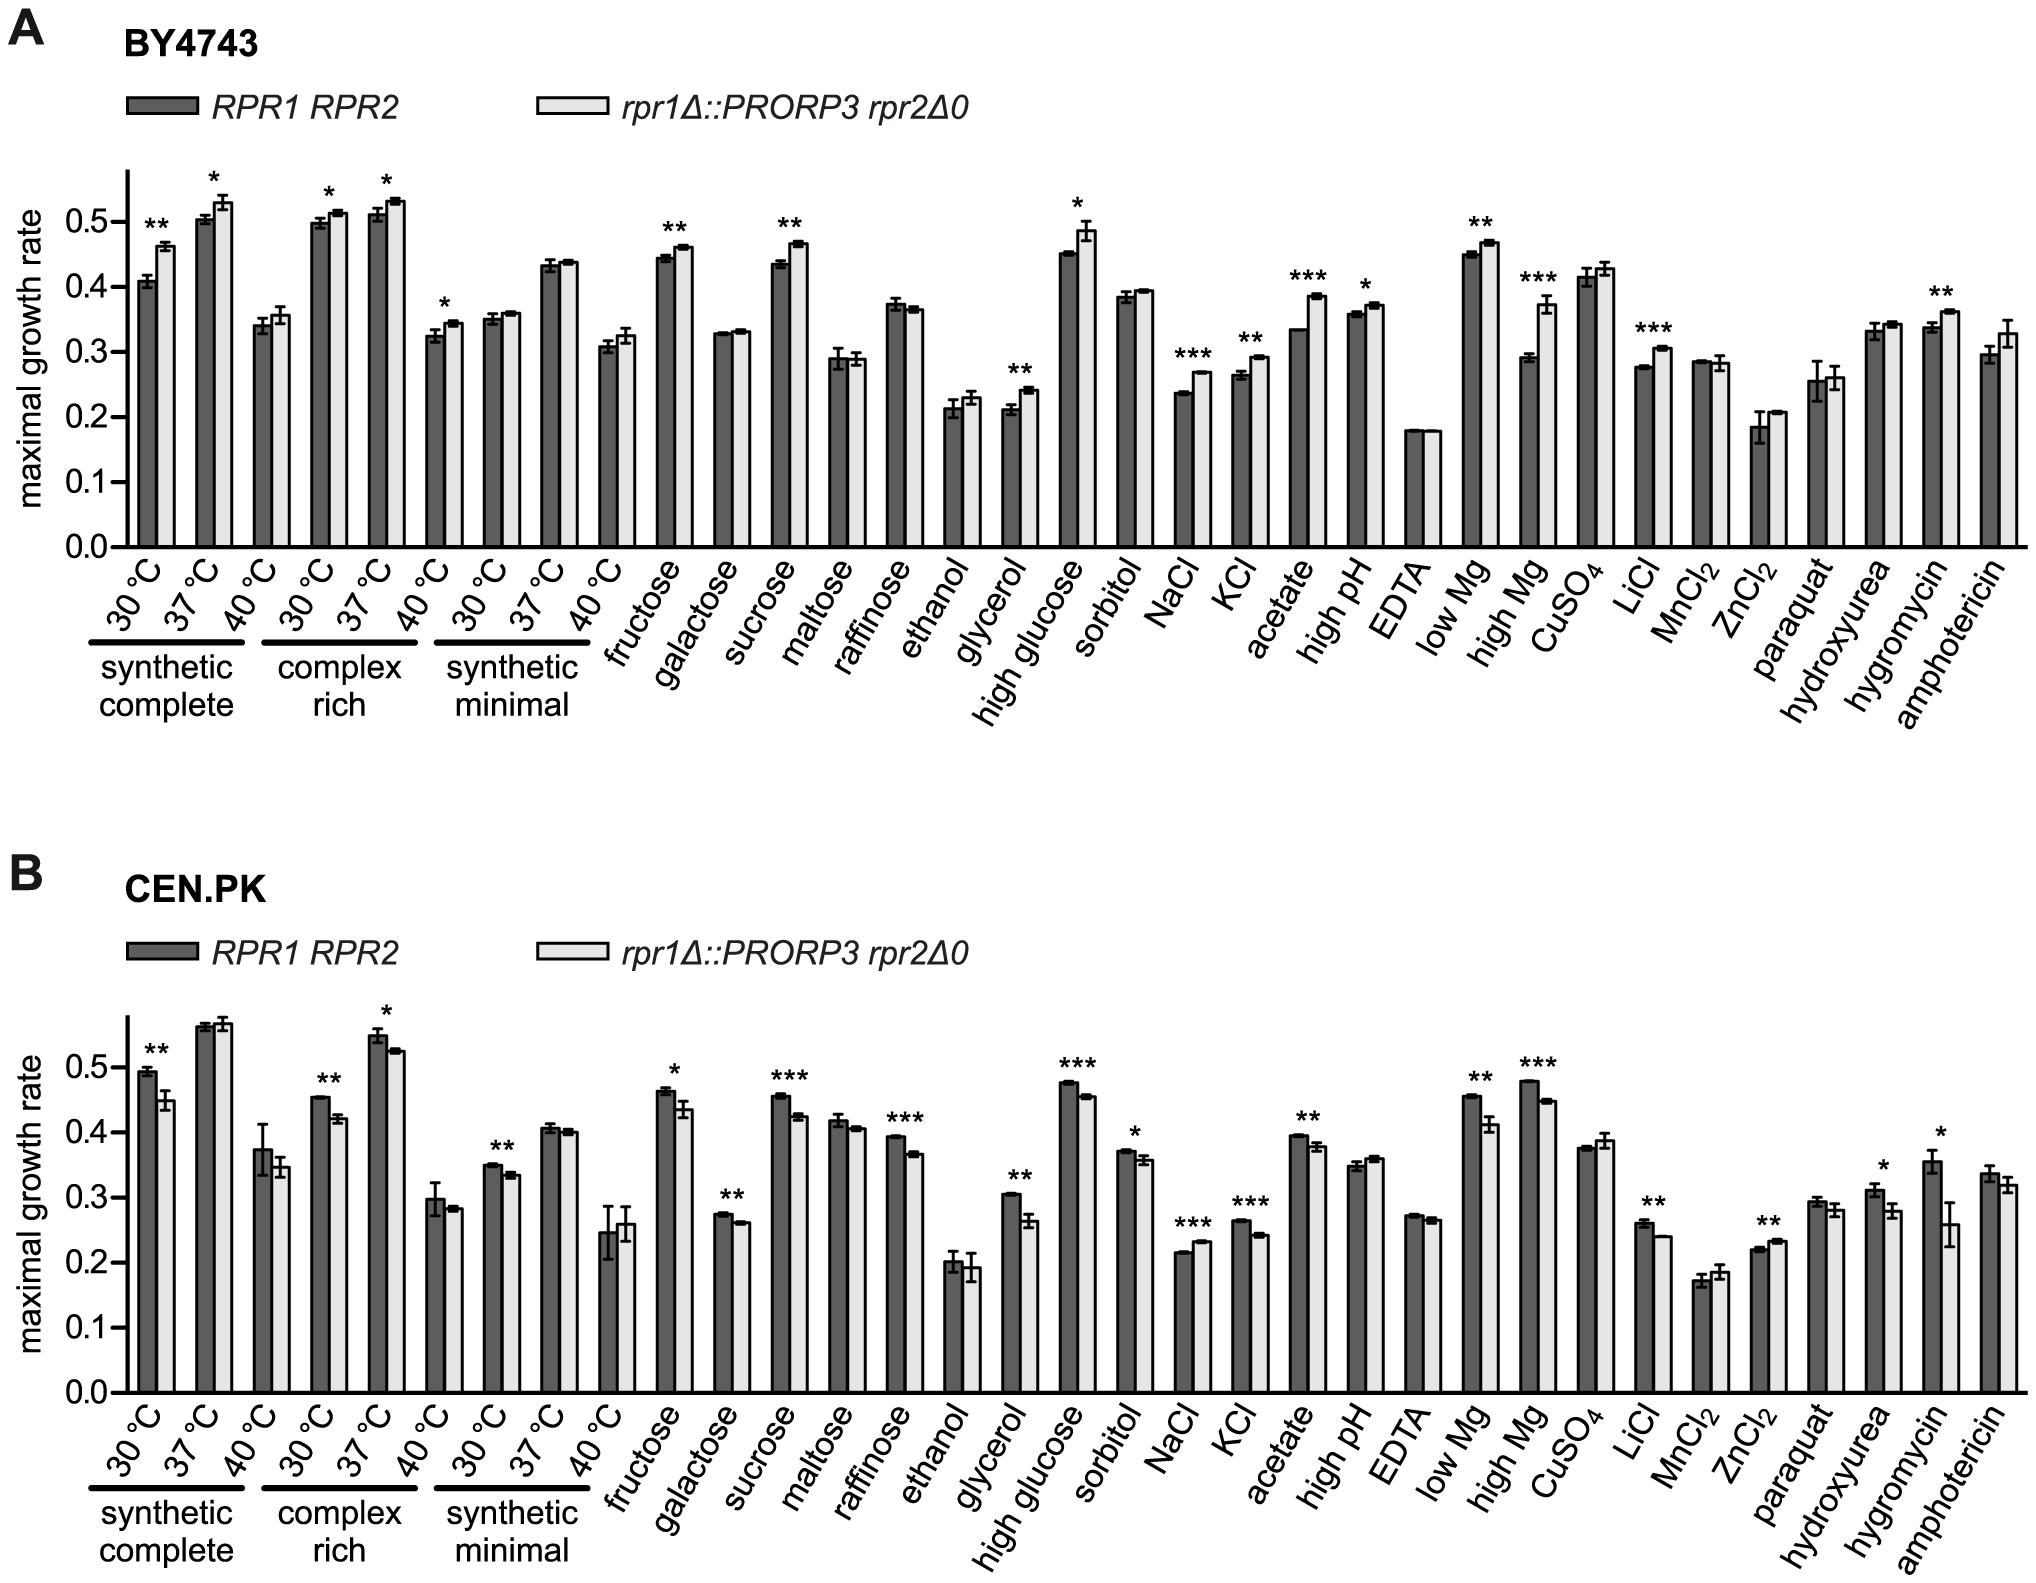 Quantitative phenotypic profiling of RNase P-swapped yeast strains.